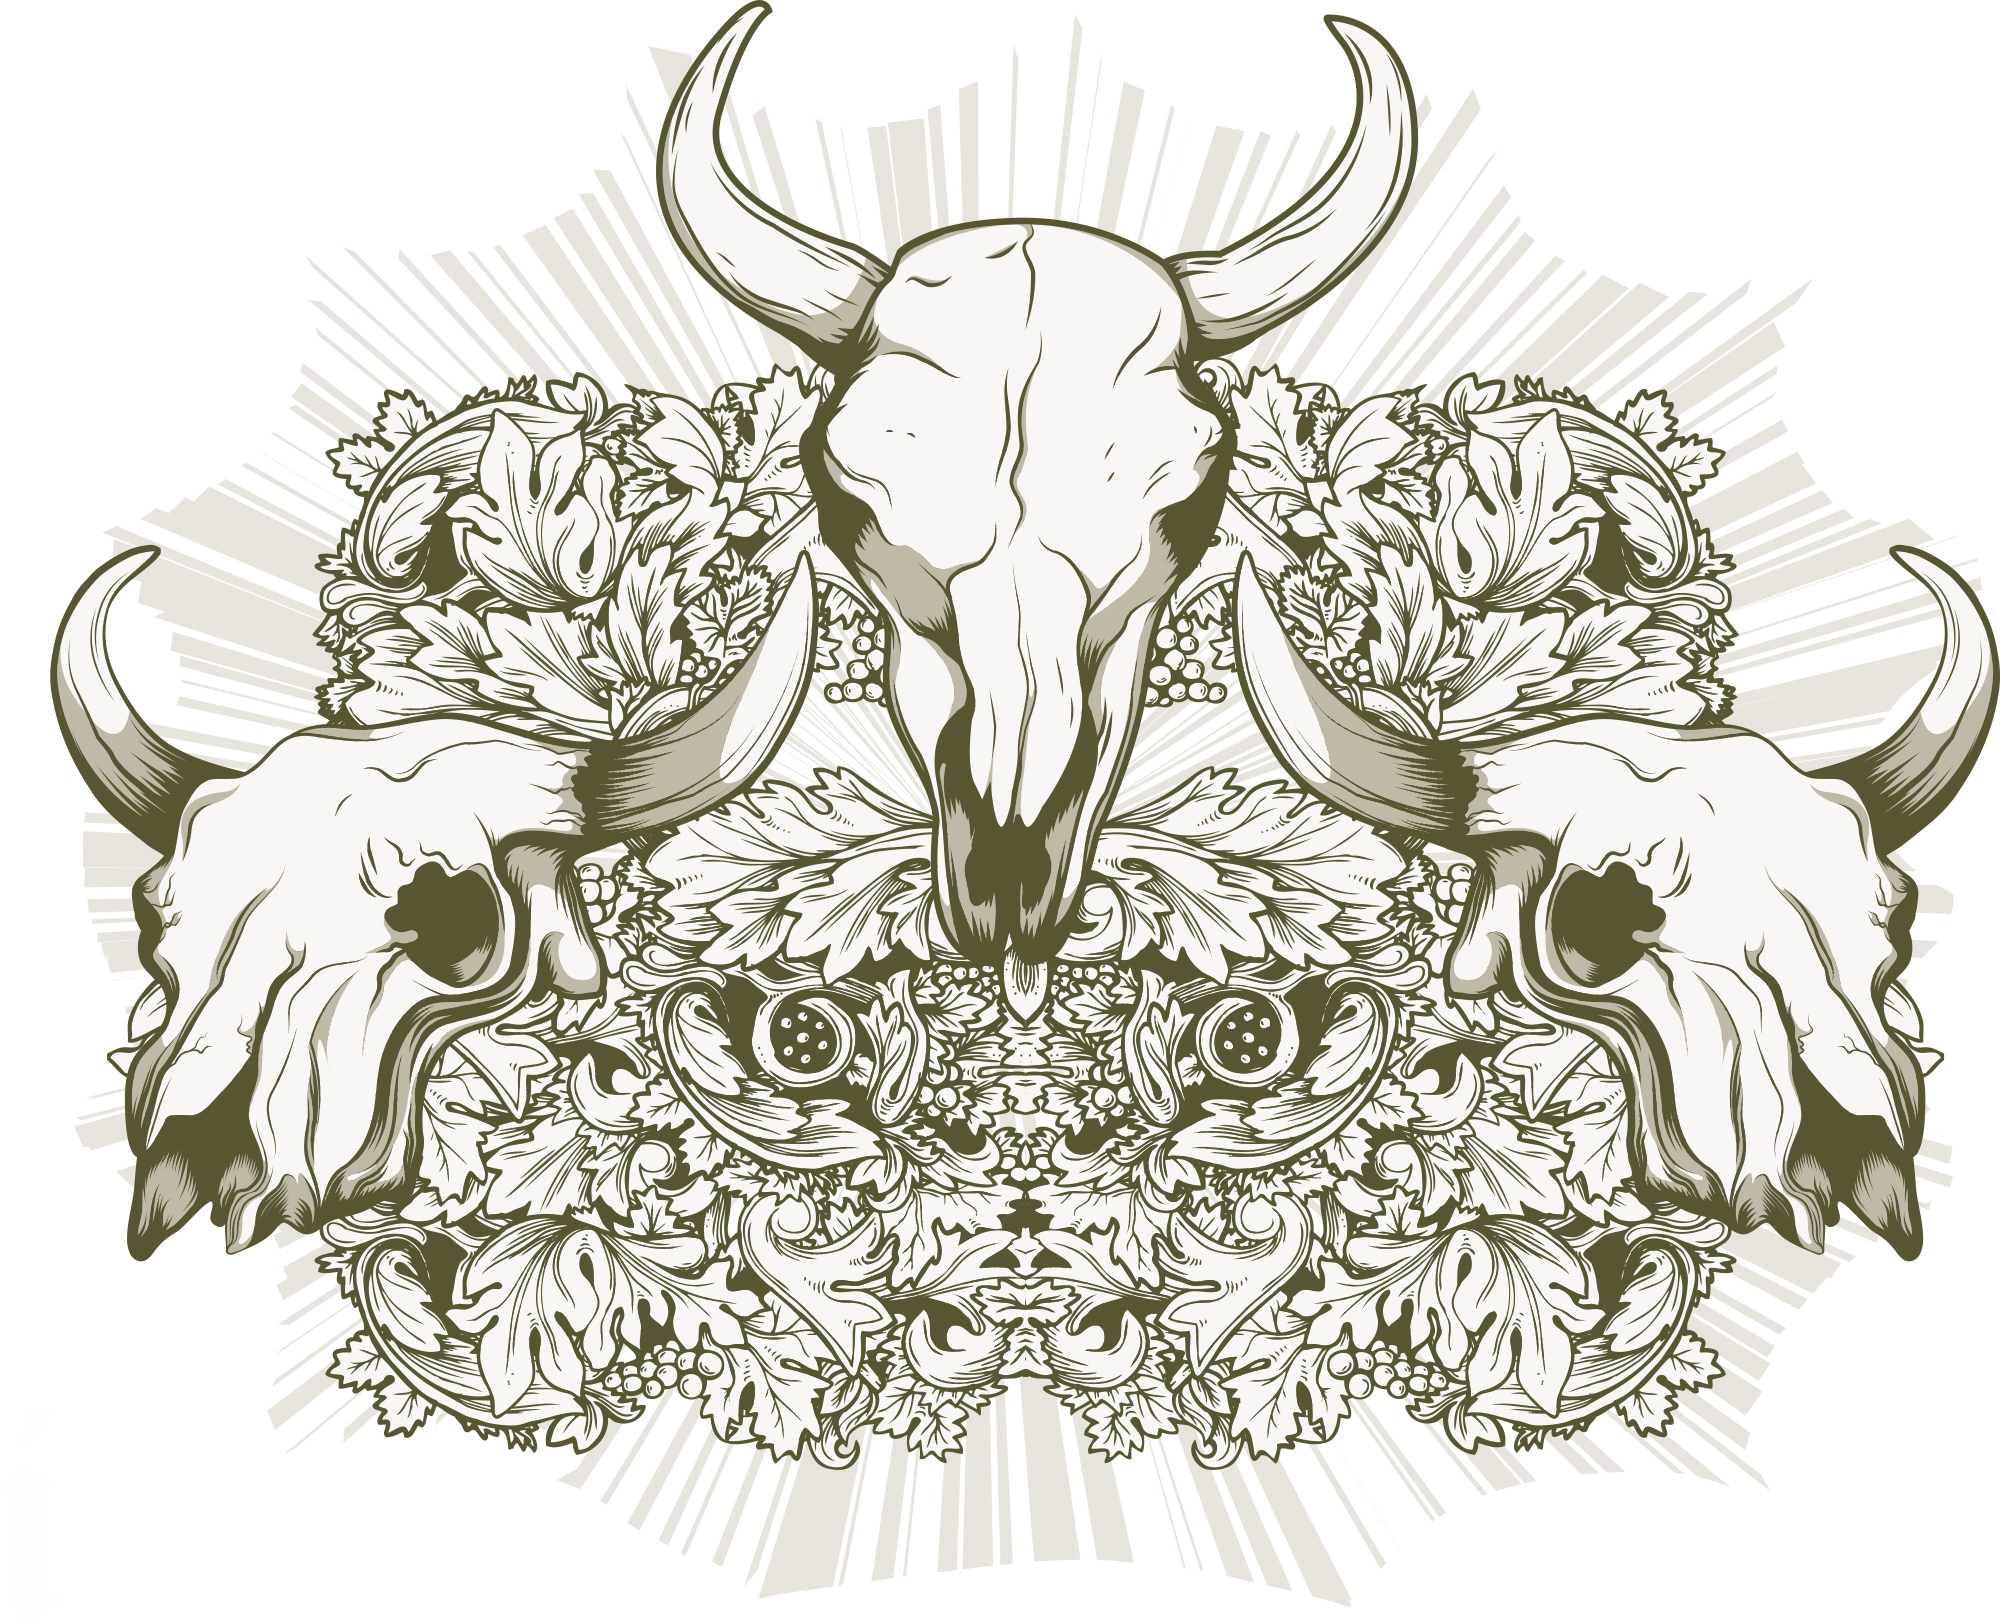 Animal Skull Print Free Vector